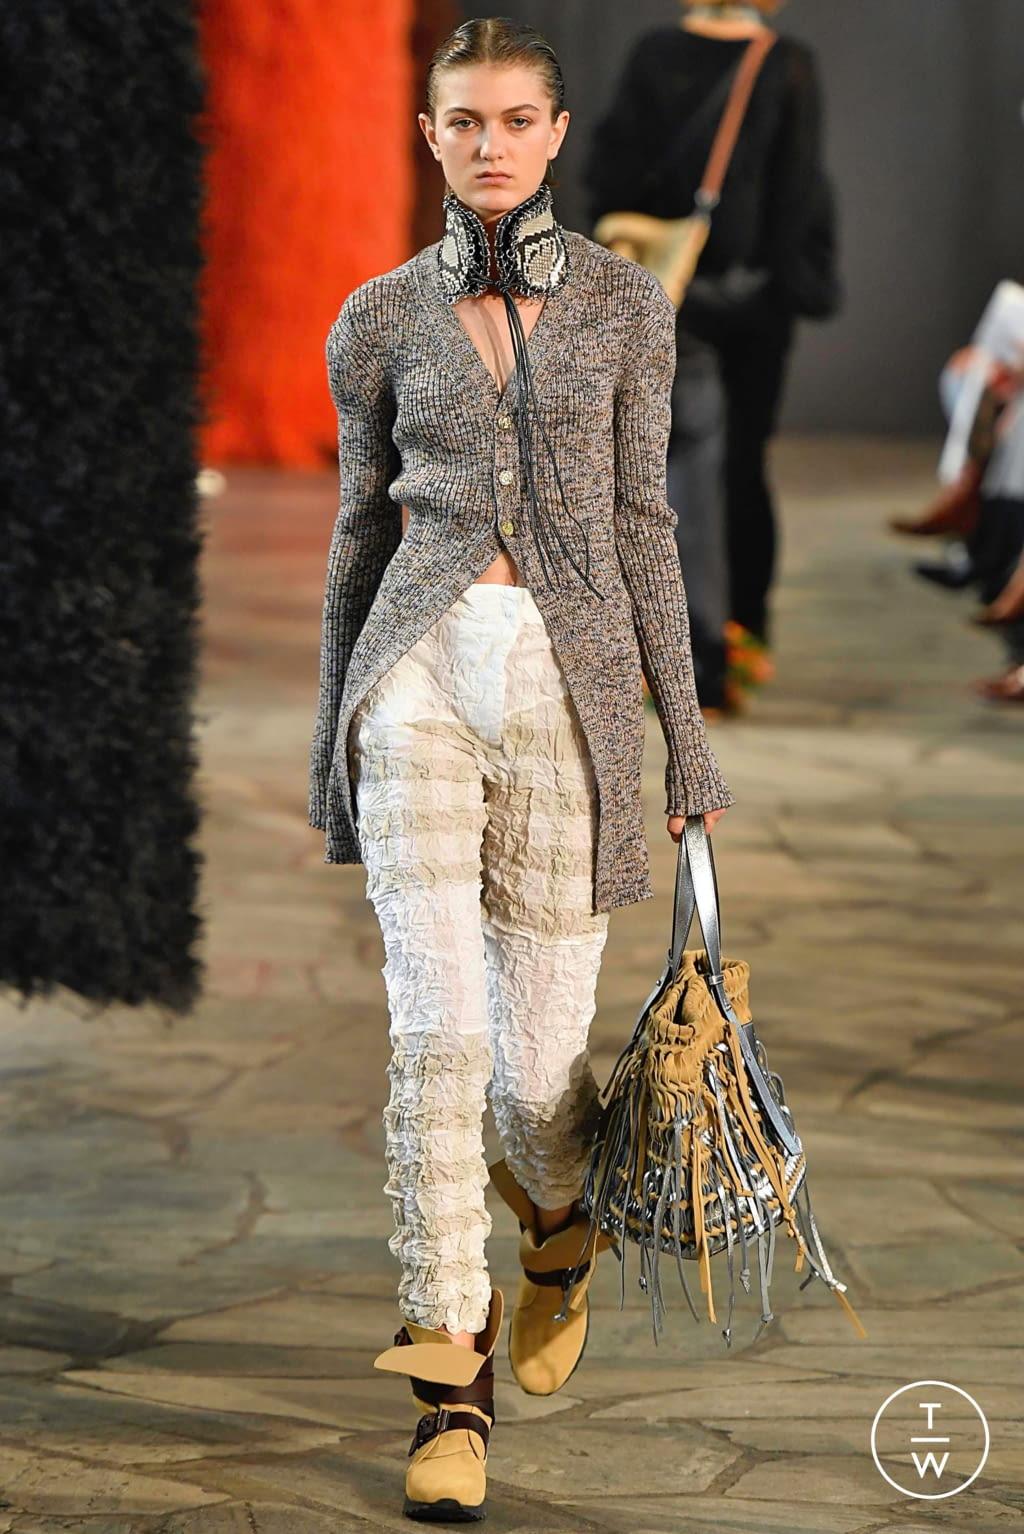 Bébé Garçons Espagnol Style Romani Body Chemise Pantalon /& Nœud Papillon Outfit SS19